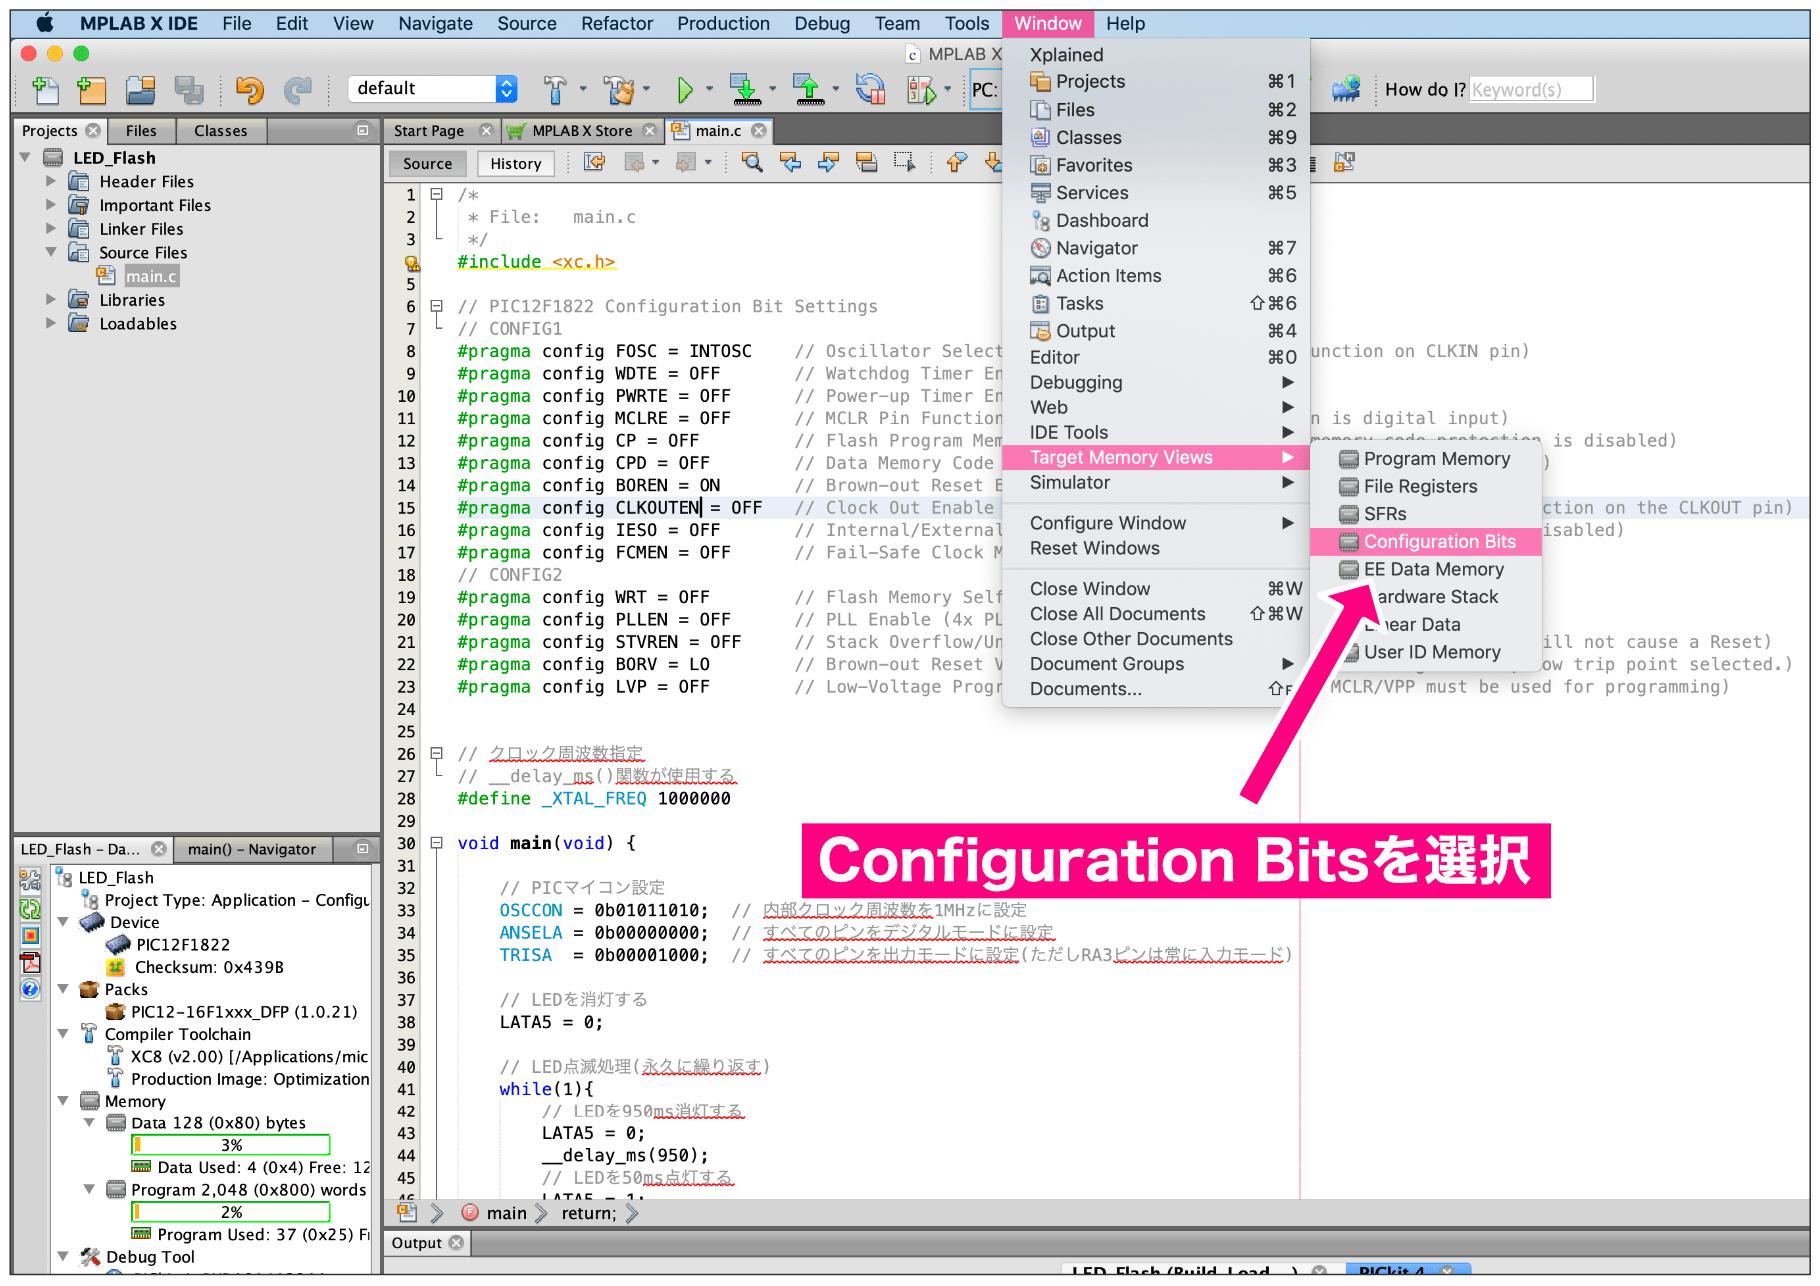 Configuration Bitsメニュー